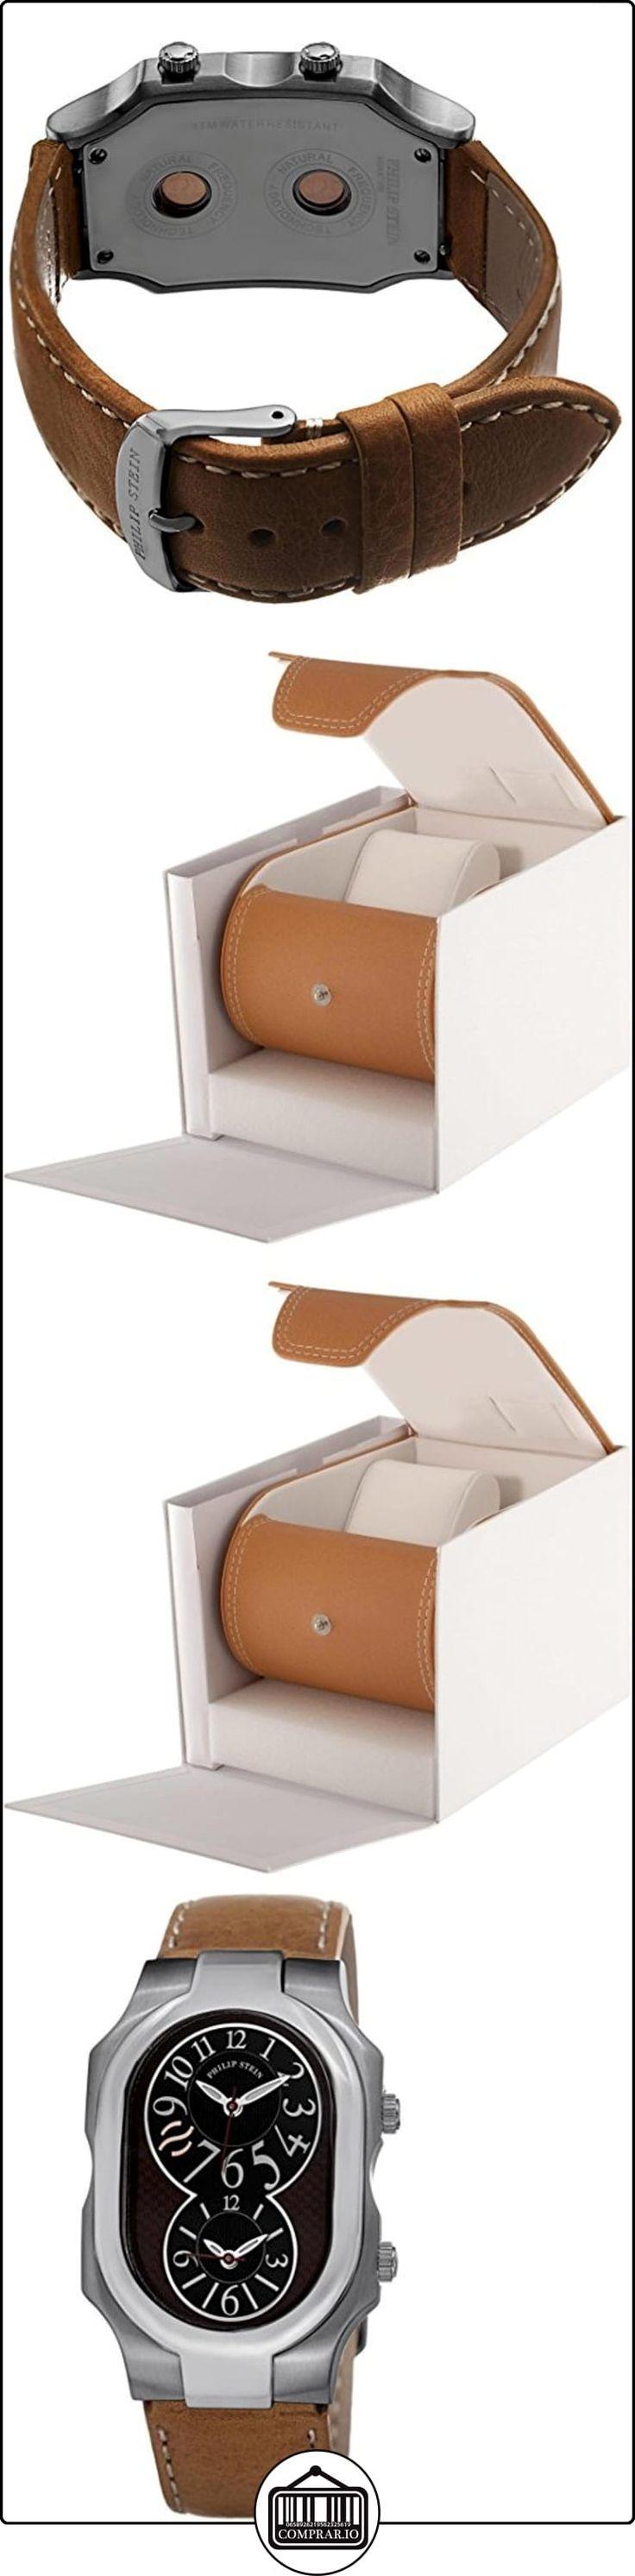 Philip Stein Women's 32mm Brown Calfskin Stainless Steel Case Watch 2BRNCSTC  ✿ Relojes para mujer - (Lujo) ✿